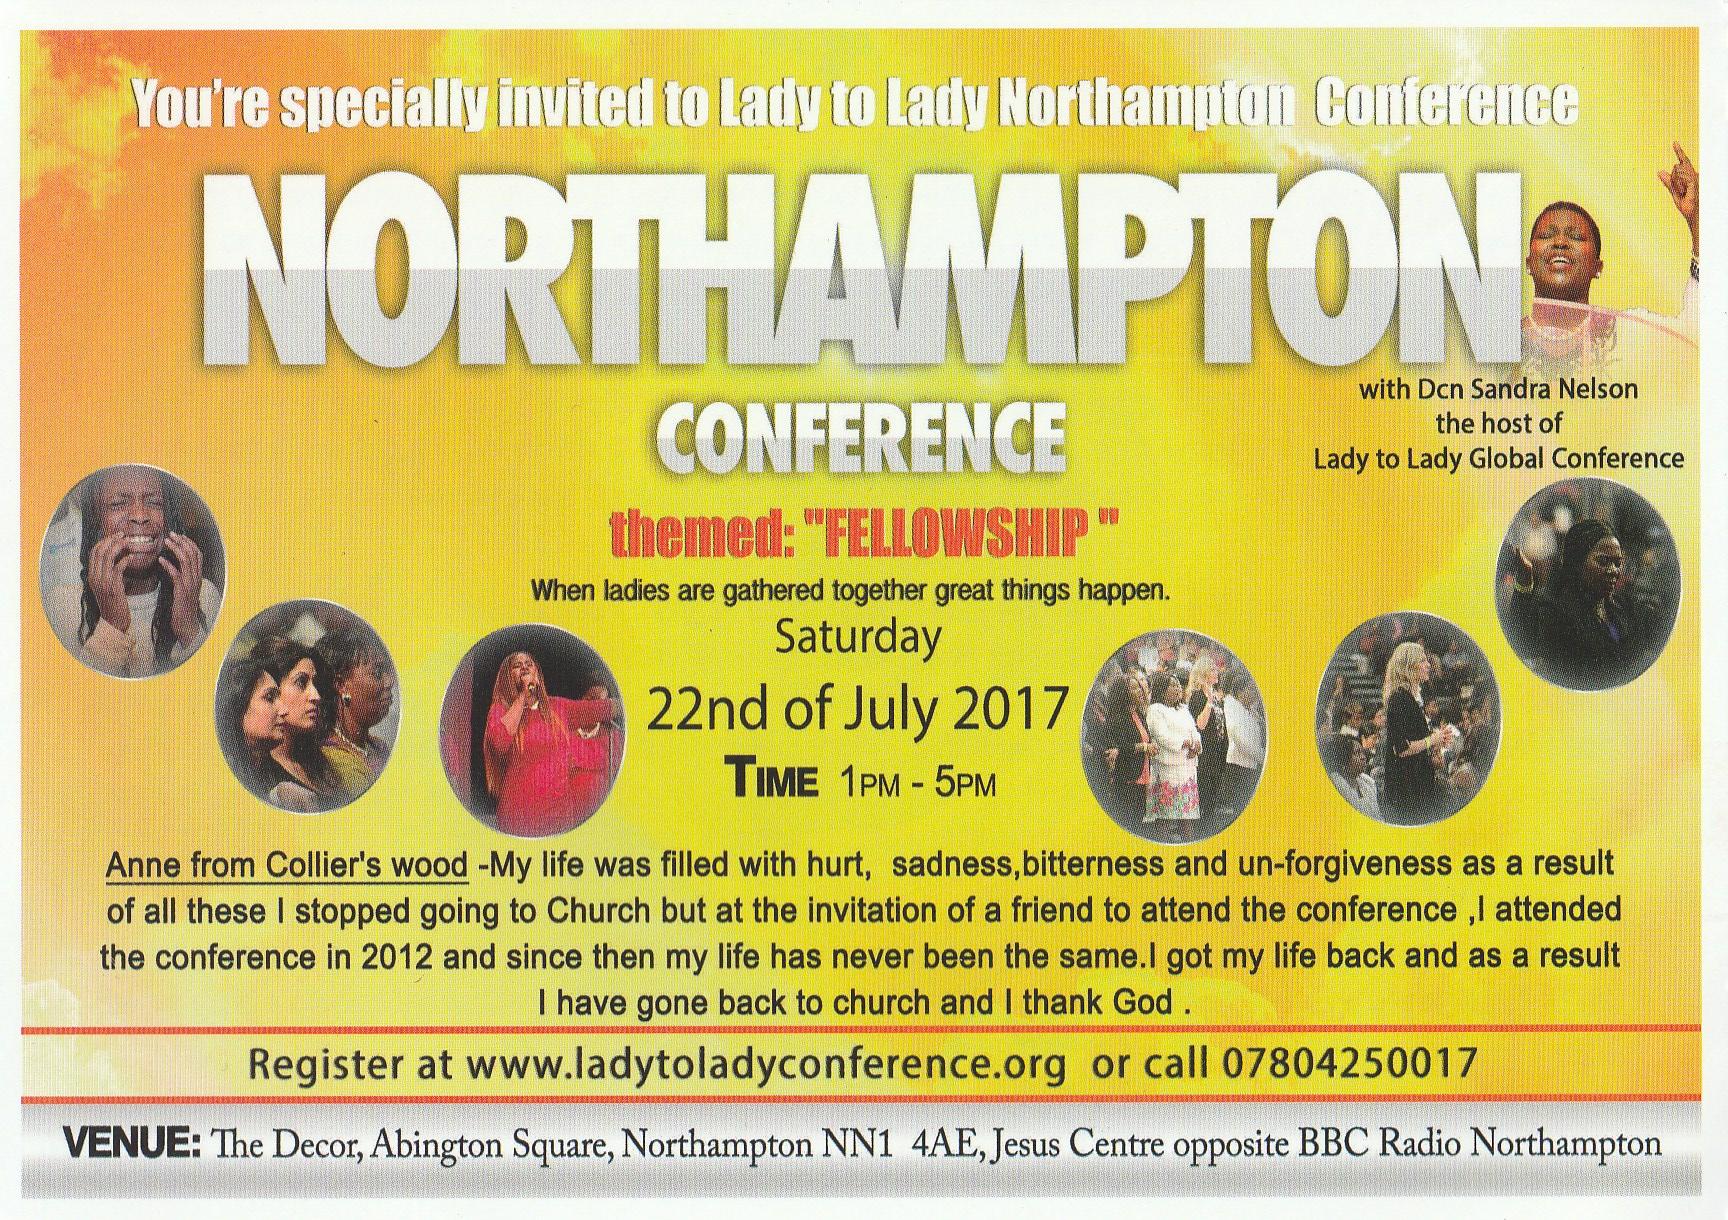 NorthamptonConference.jpg